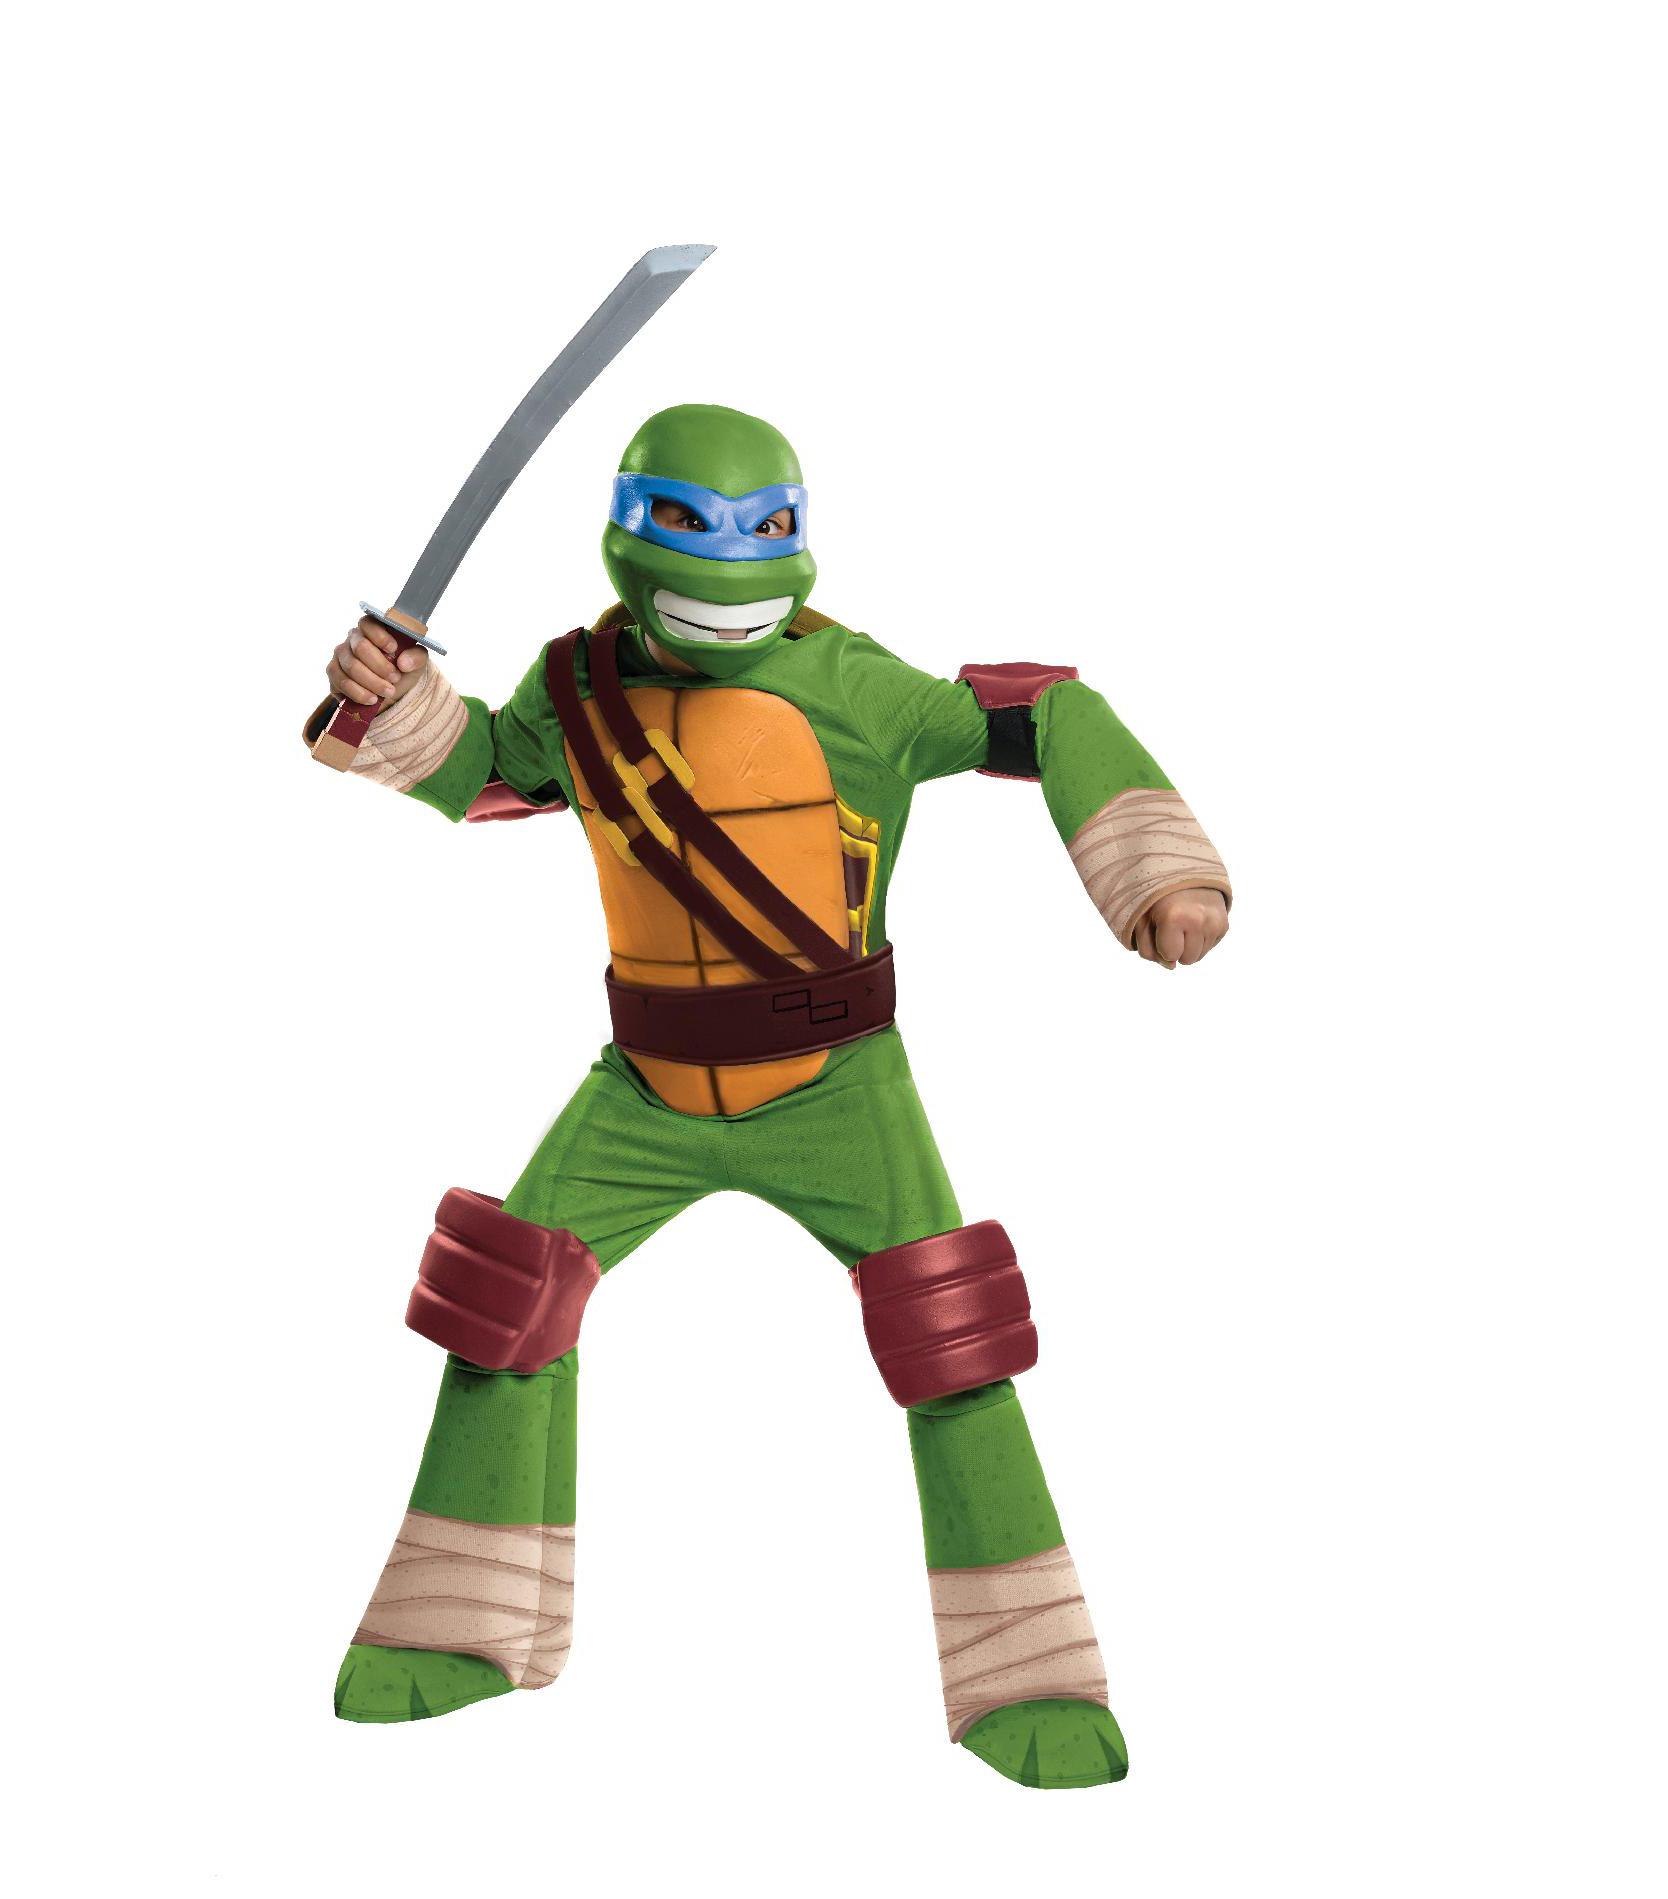 ninja toy model instructions